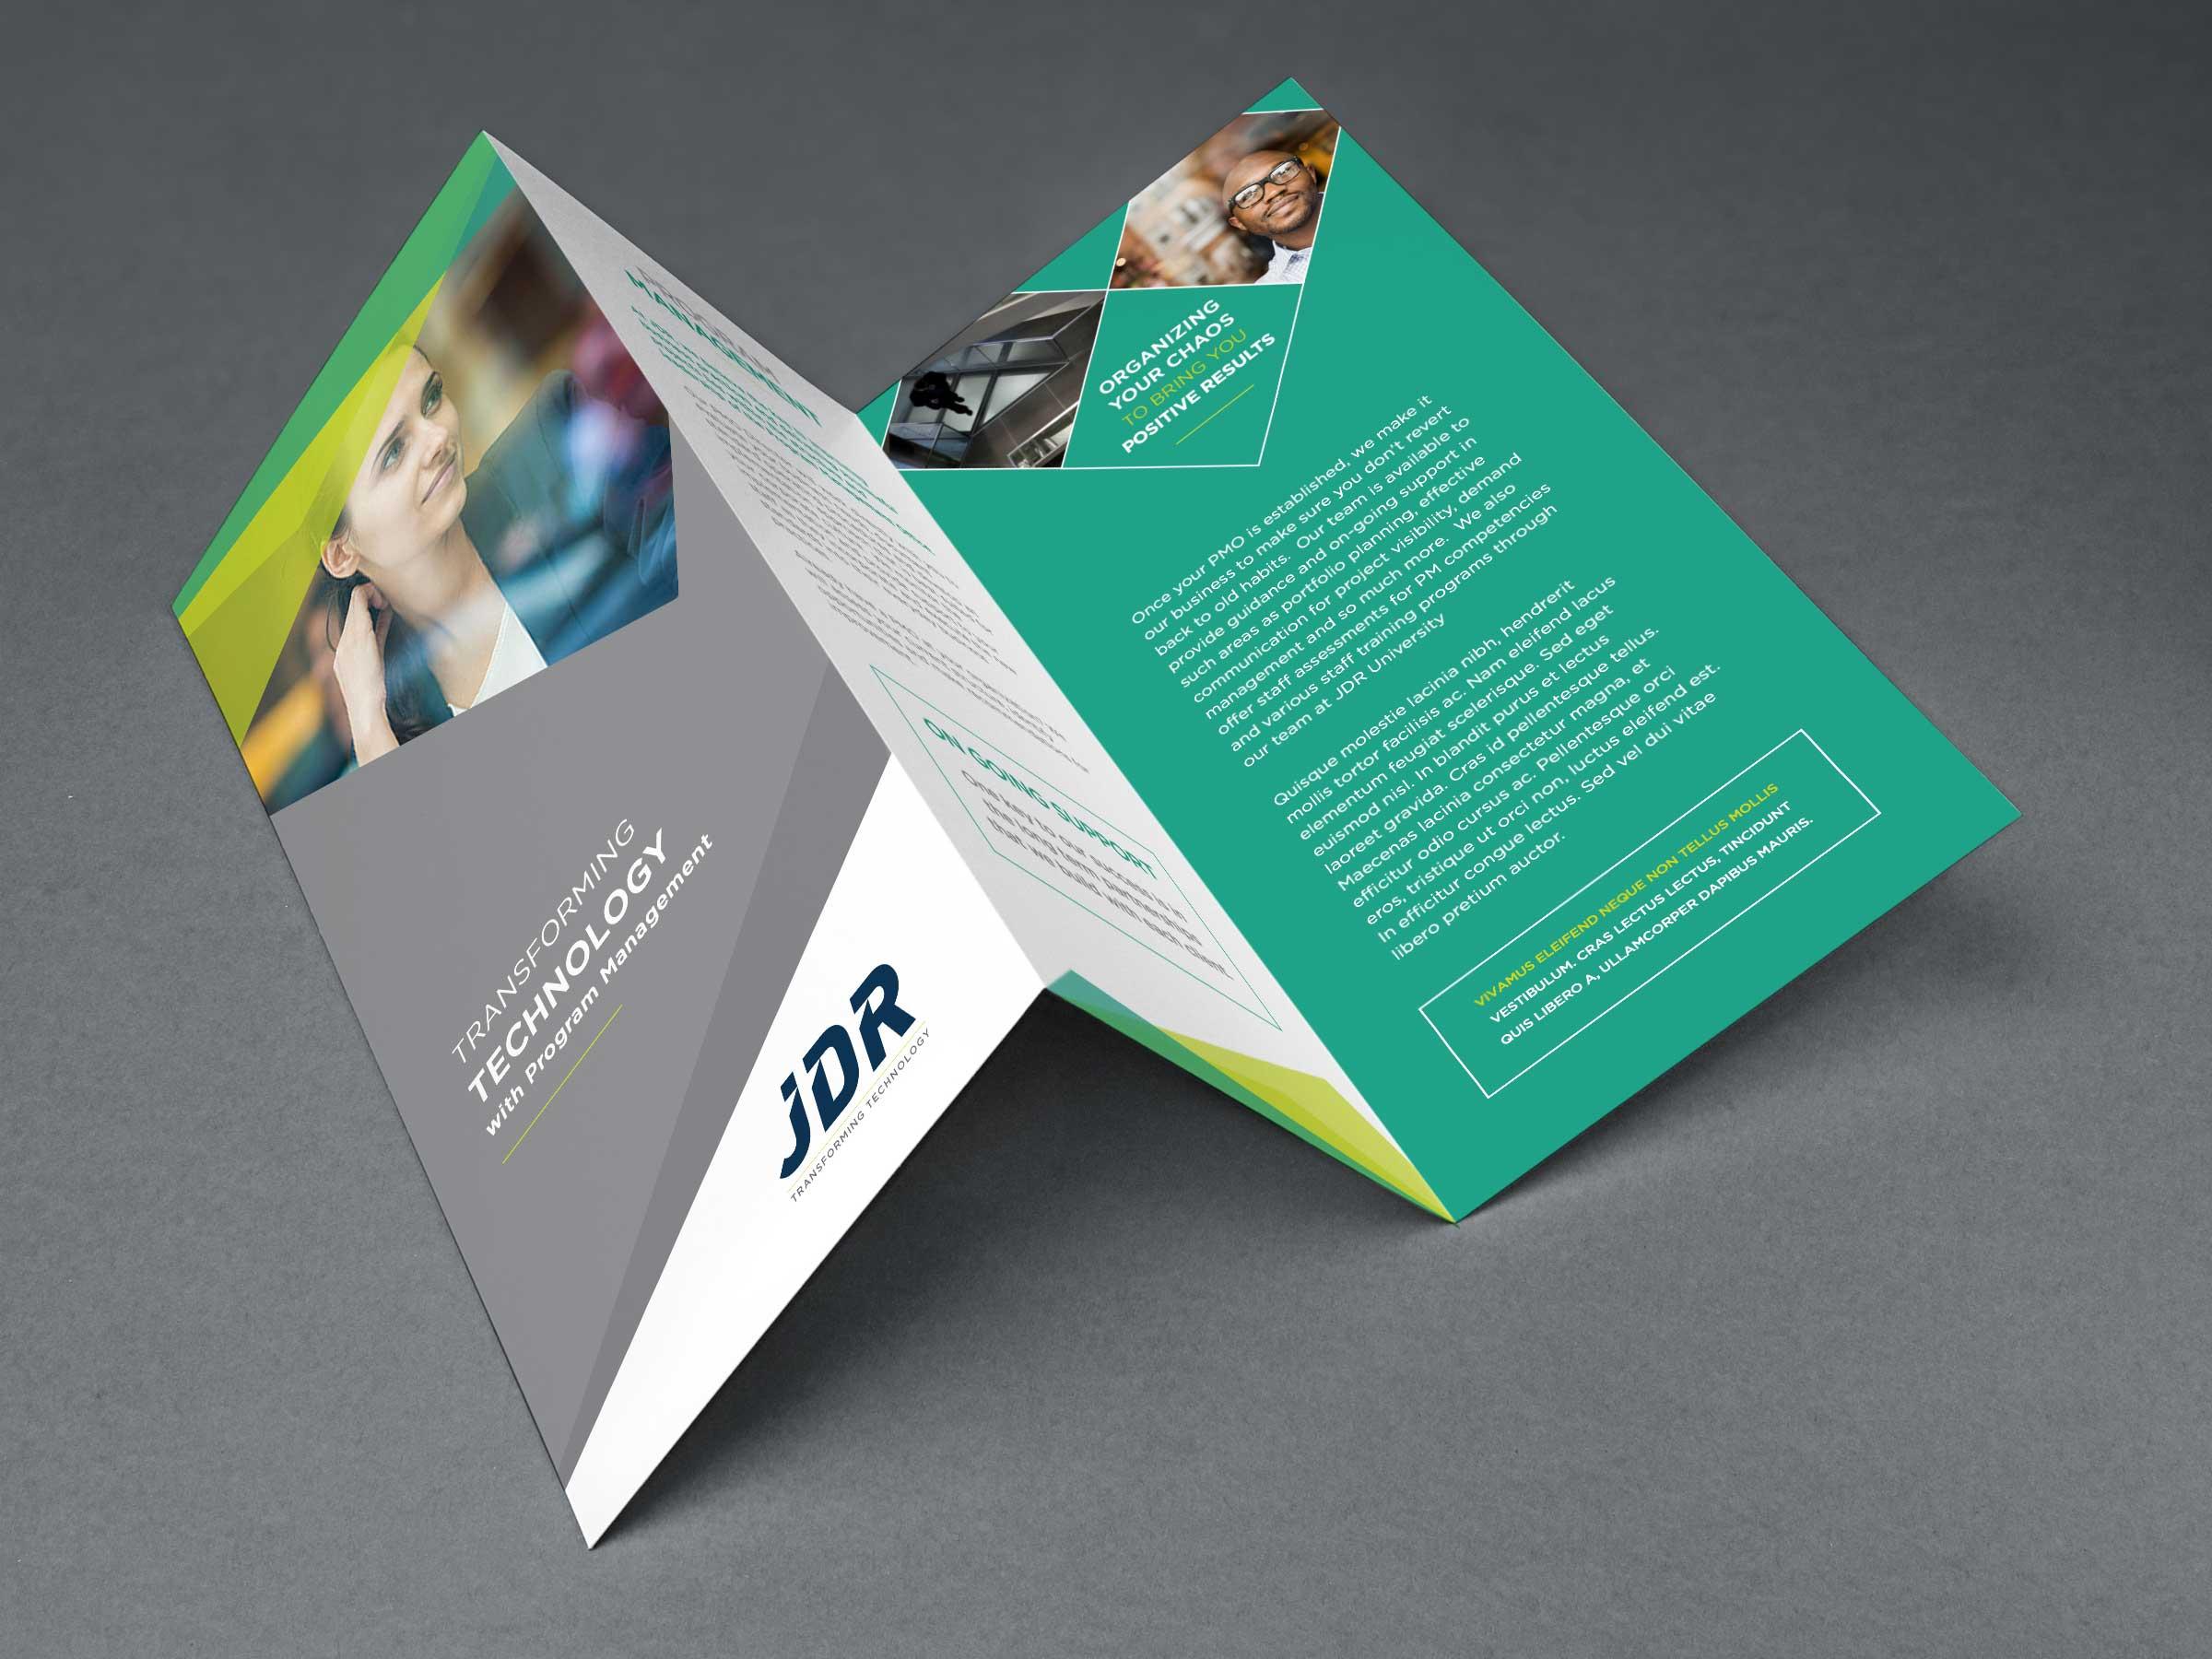 Mockup_TriFold_Brochure.jpg